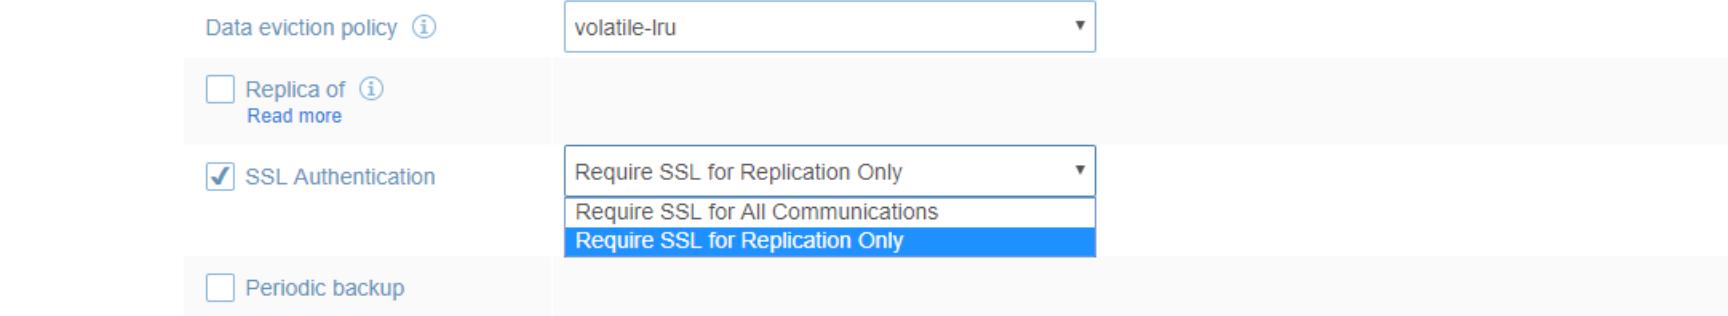 Replic-of Encryption